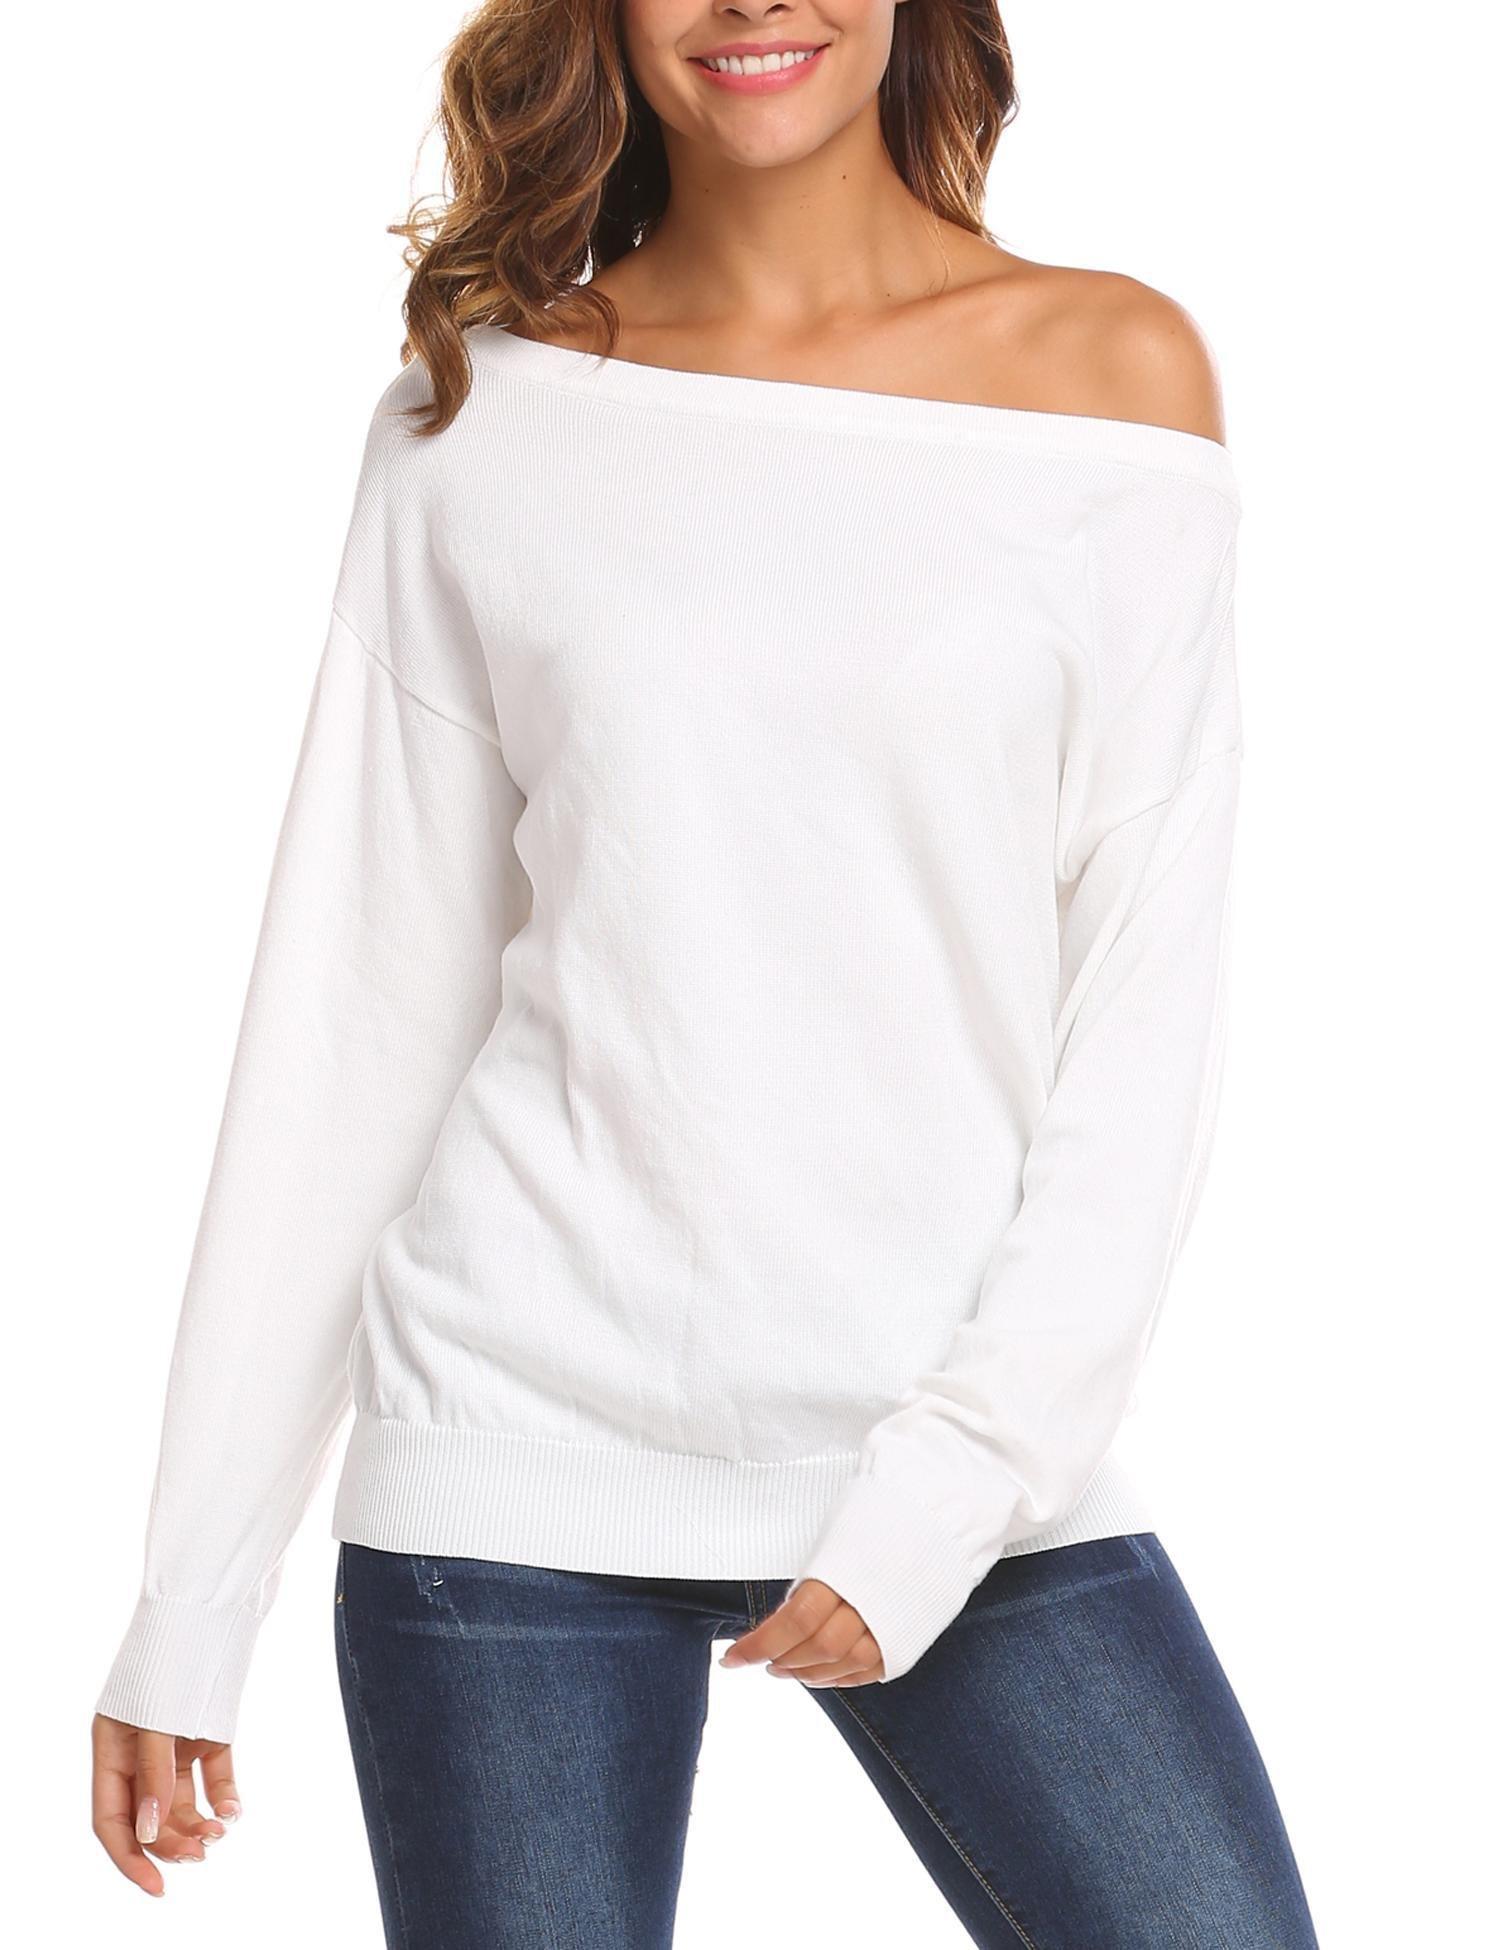 SoTeer Women Warm Long Sleeve Sweater Fashion Dressy Off Shoulder Sweat Shirt Tops White M